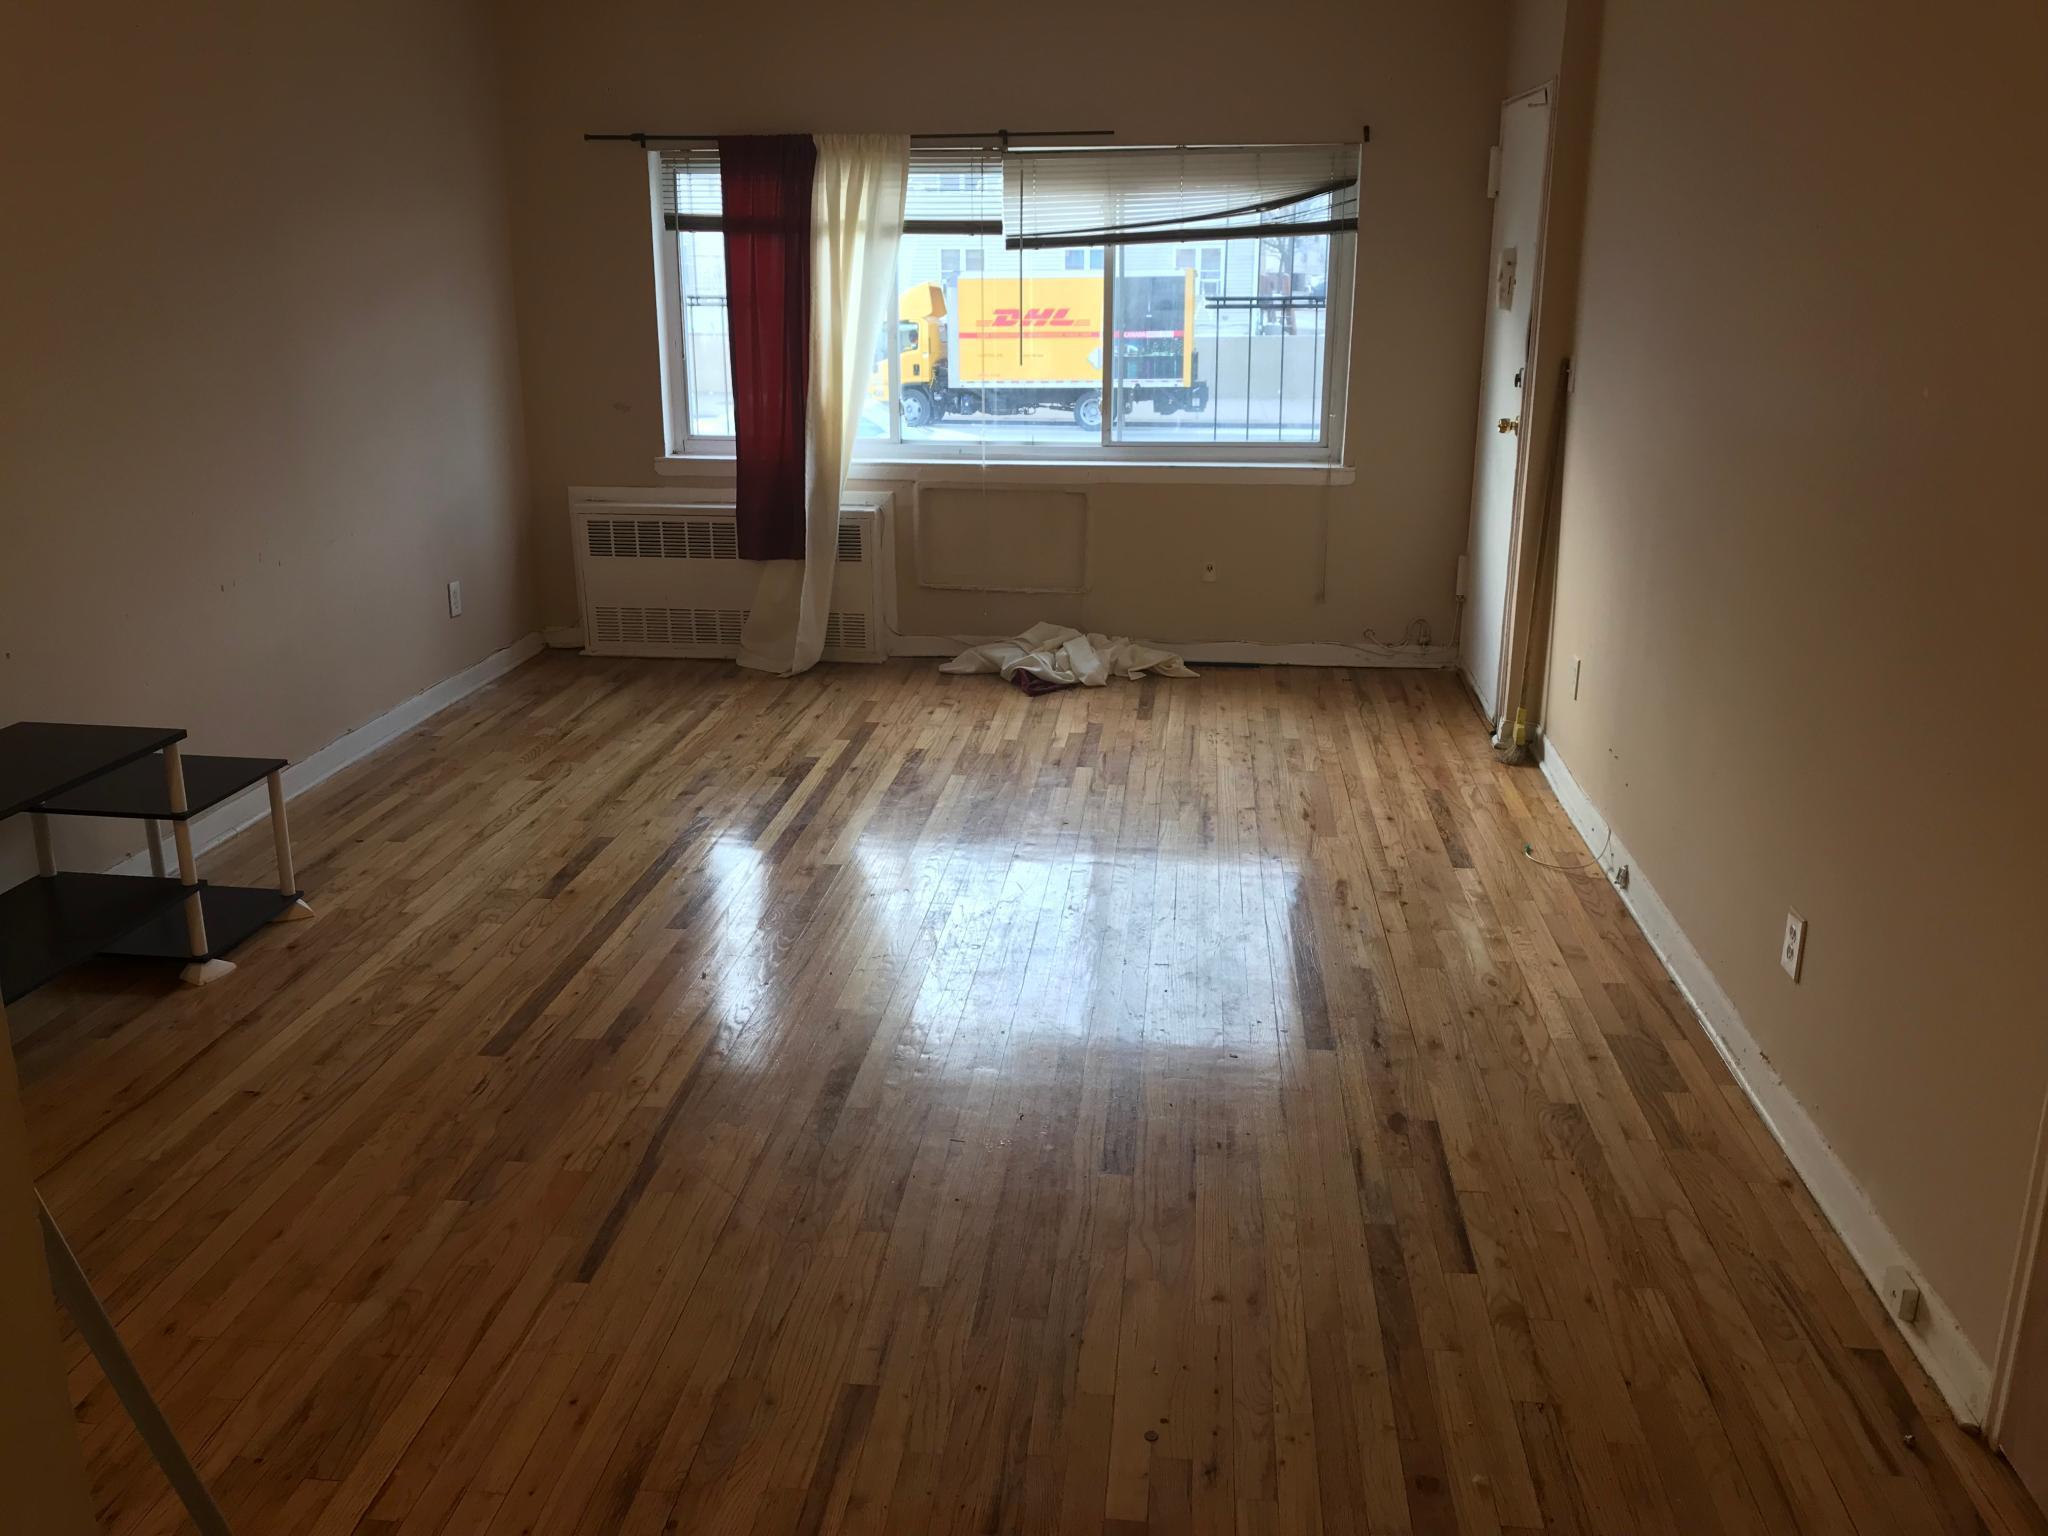 21802 141st Ave #P2, Springfield Gardens, NY 11413 For Rent | Trulia